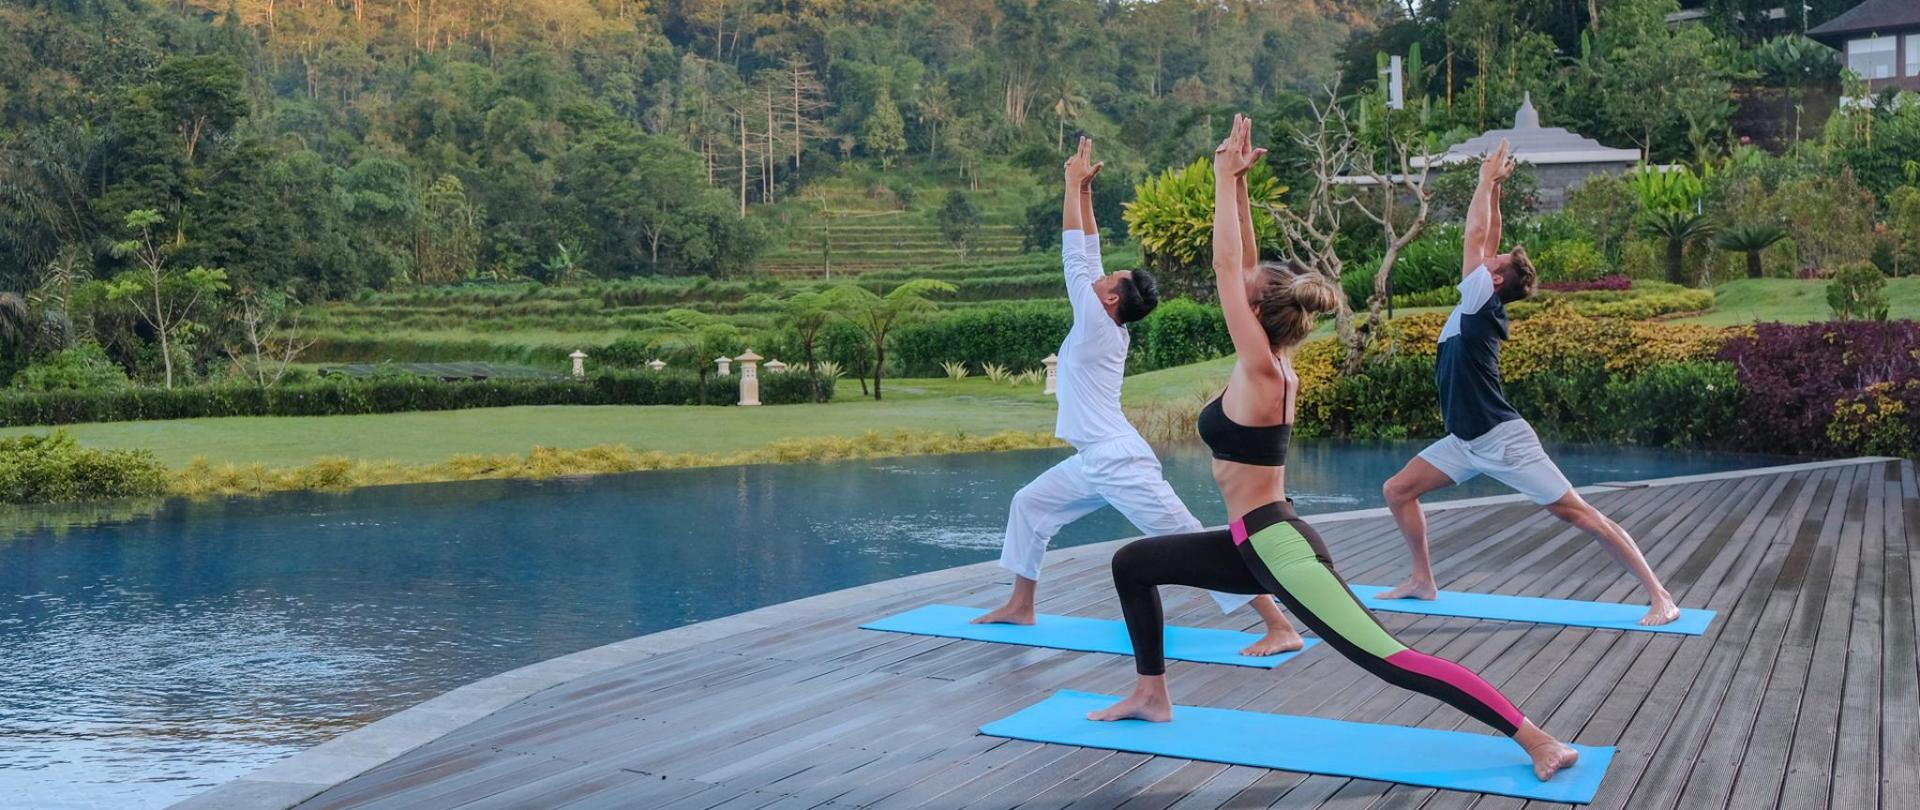 yoga pool.jpg